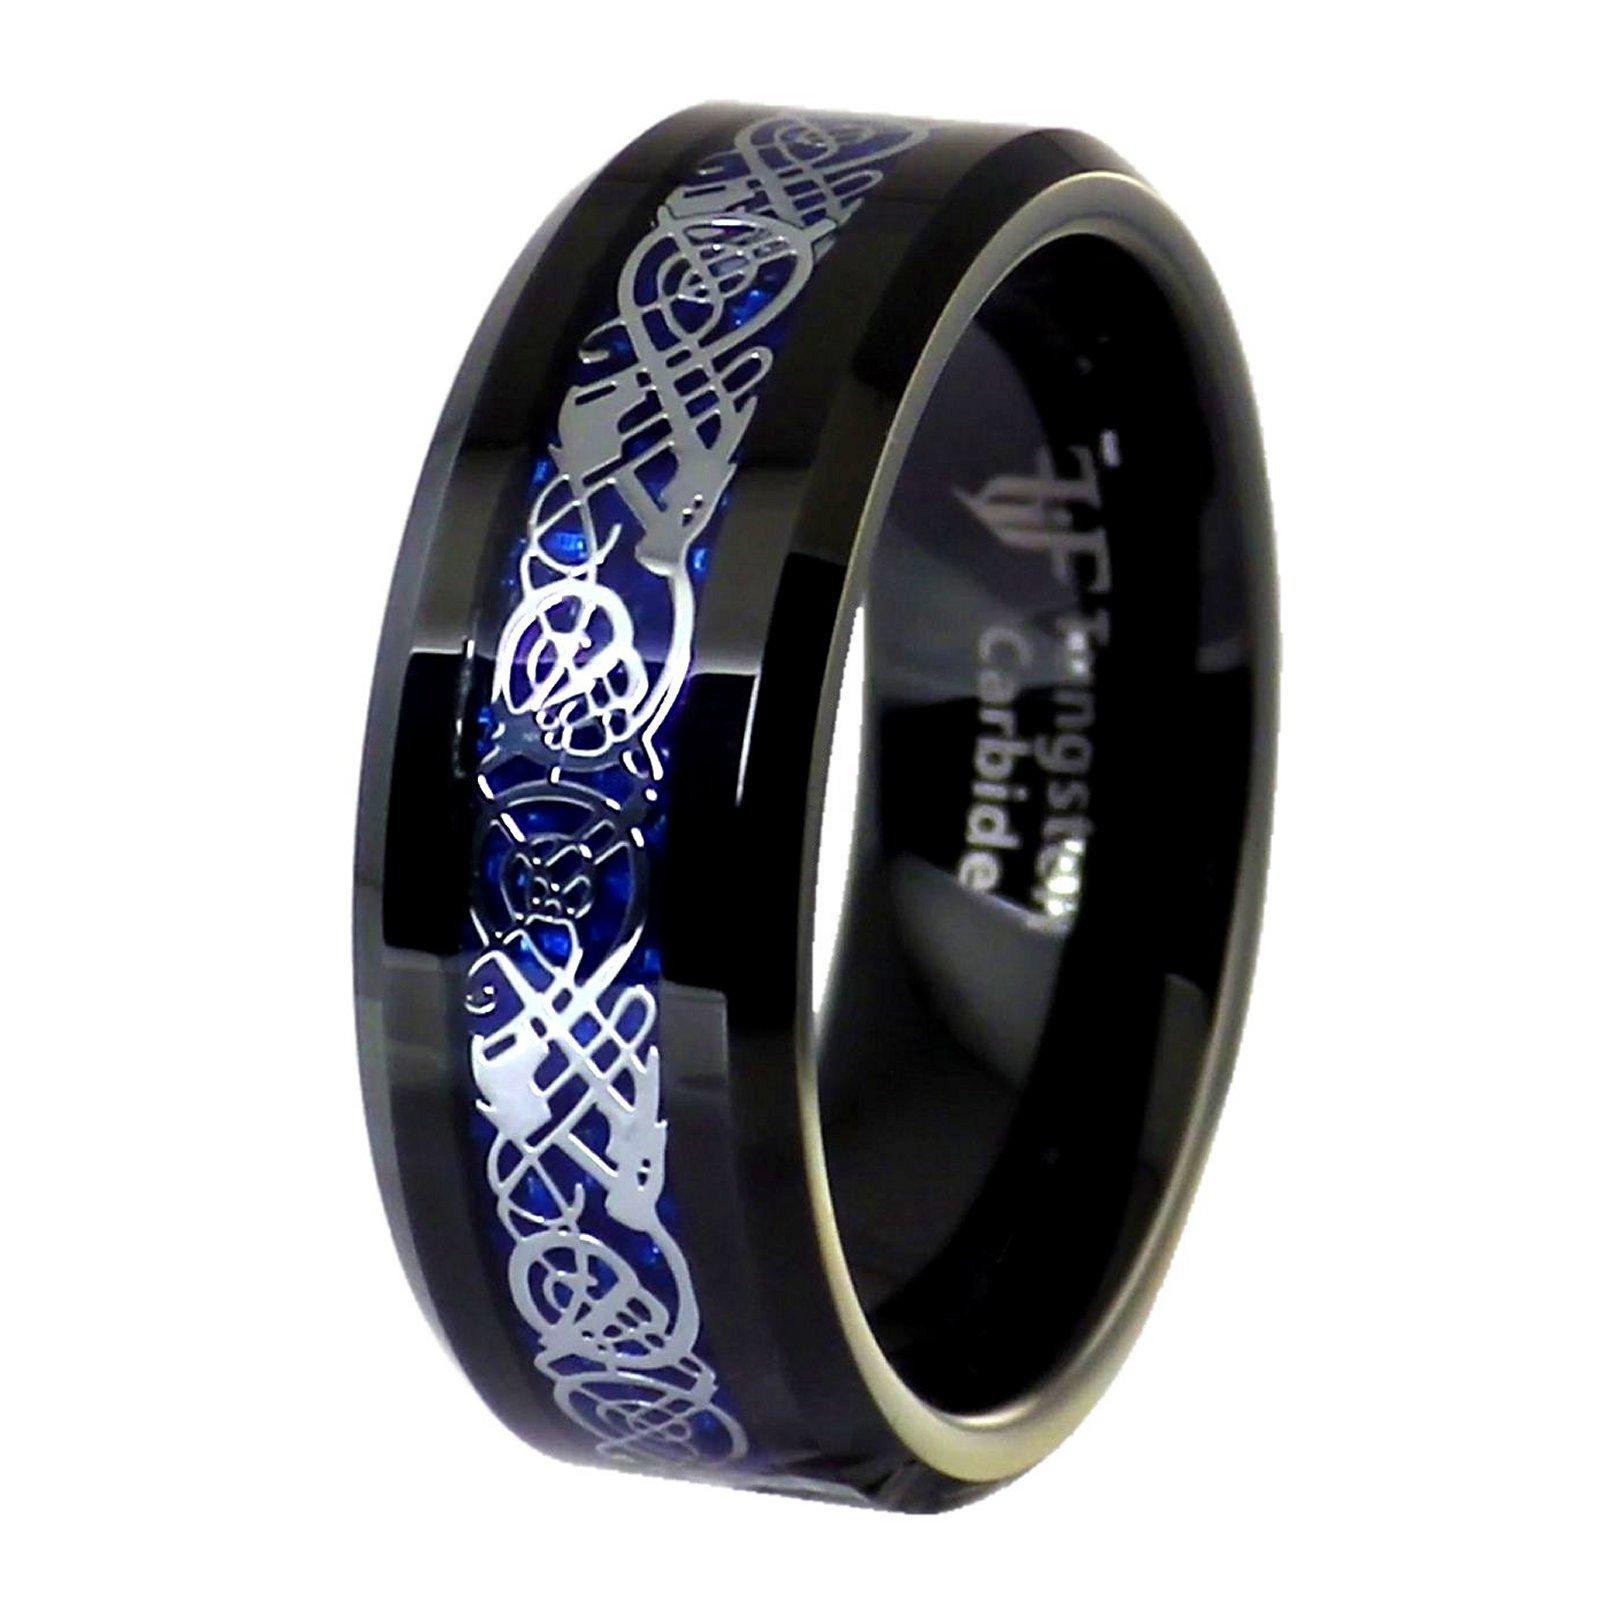 Fantasy Forge Jewelry Blue Carbon Fiber Celtic Dragon Black Tungsten Ring Size 15